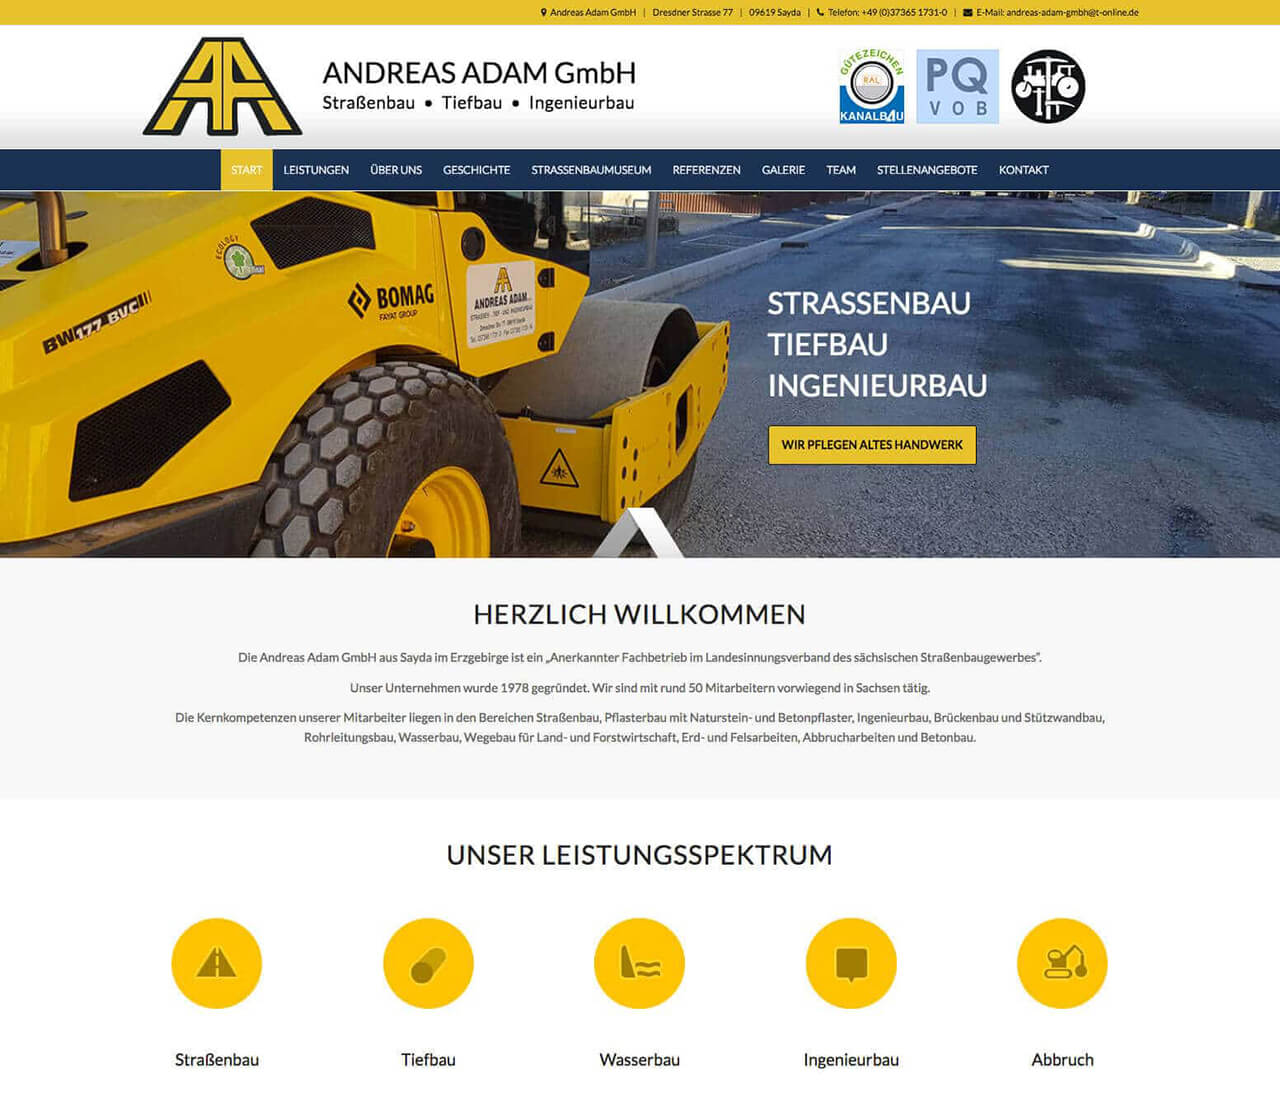 Andreas Adam GmbH